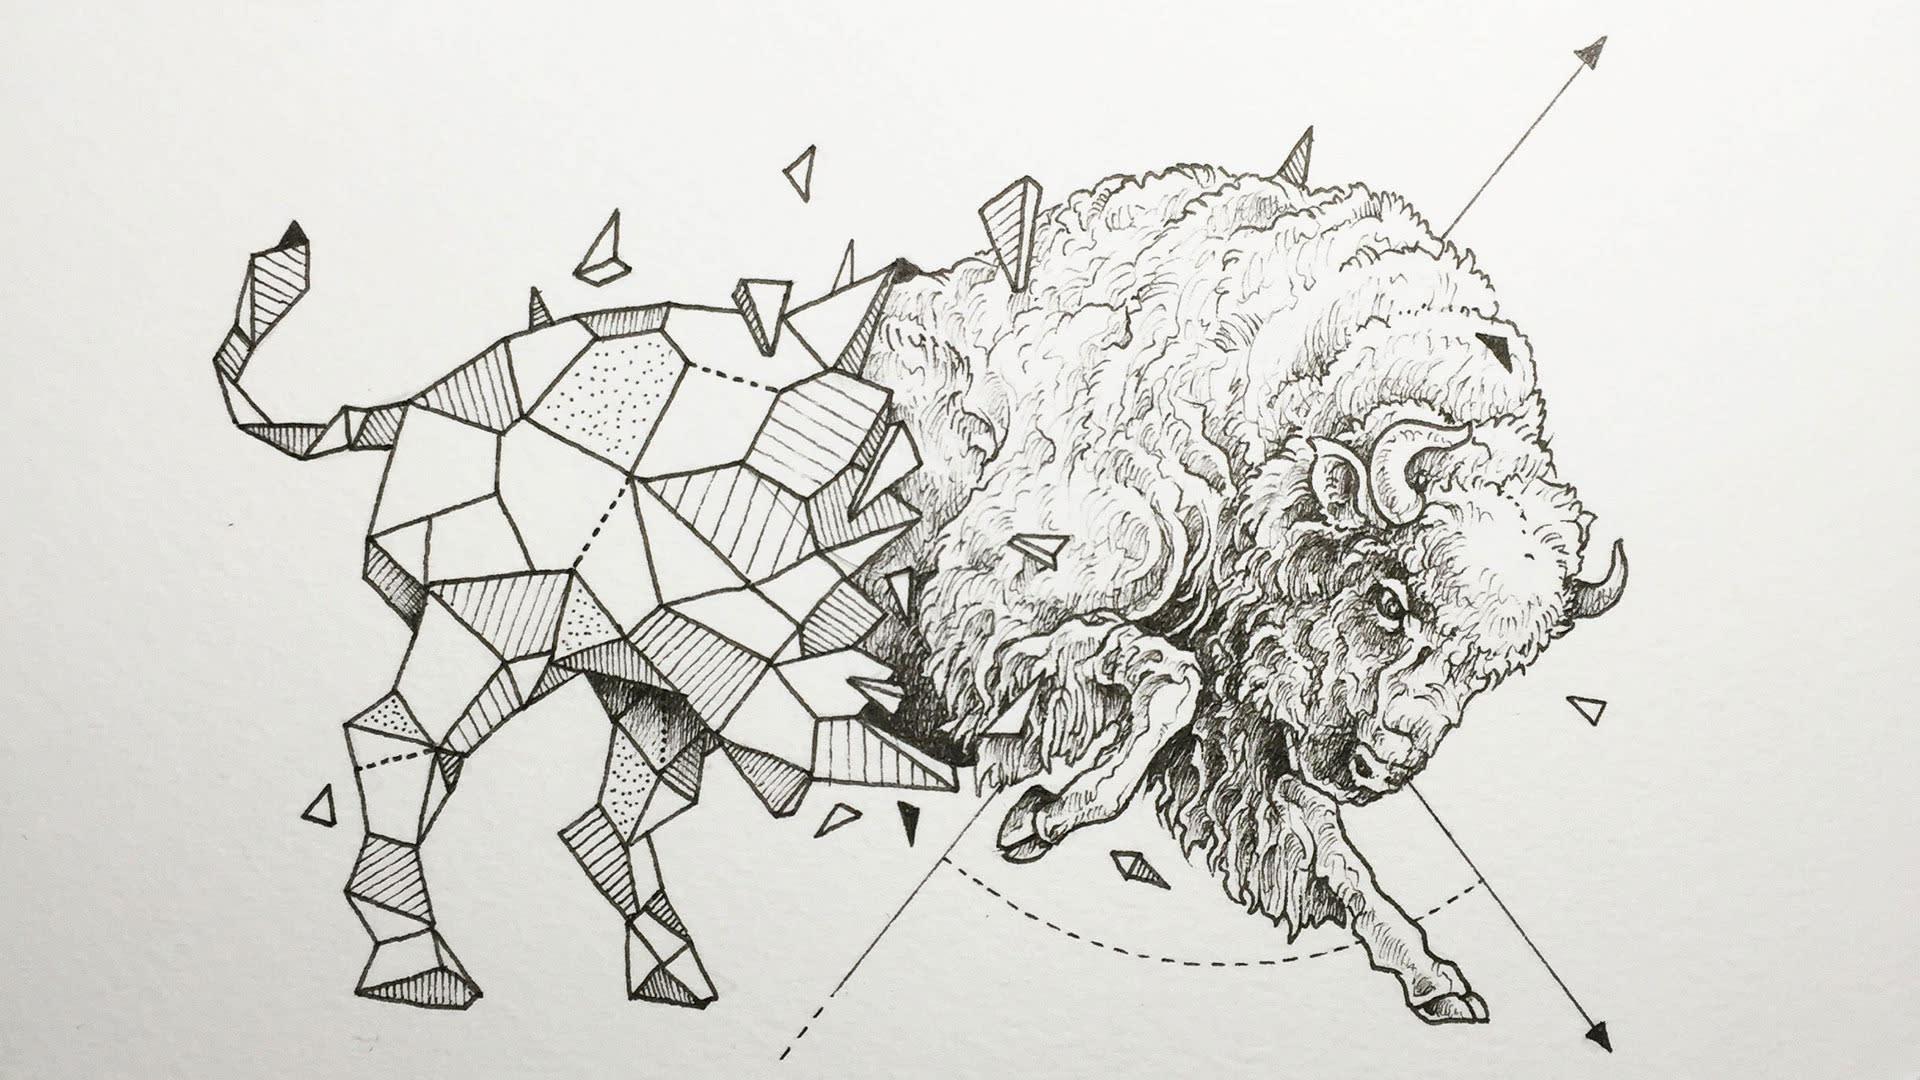 Geometric Animal Wallpaper 74 Images: Animals Meet Geometry In Striking Illustration Series